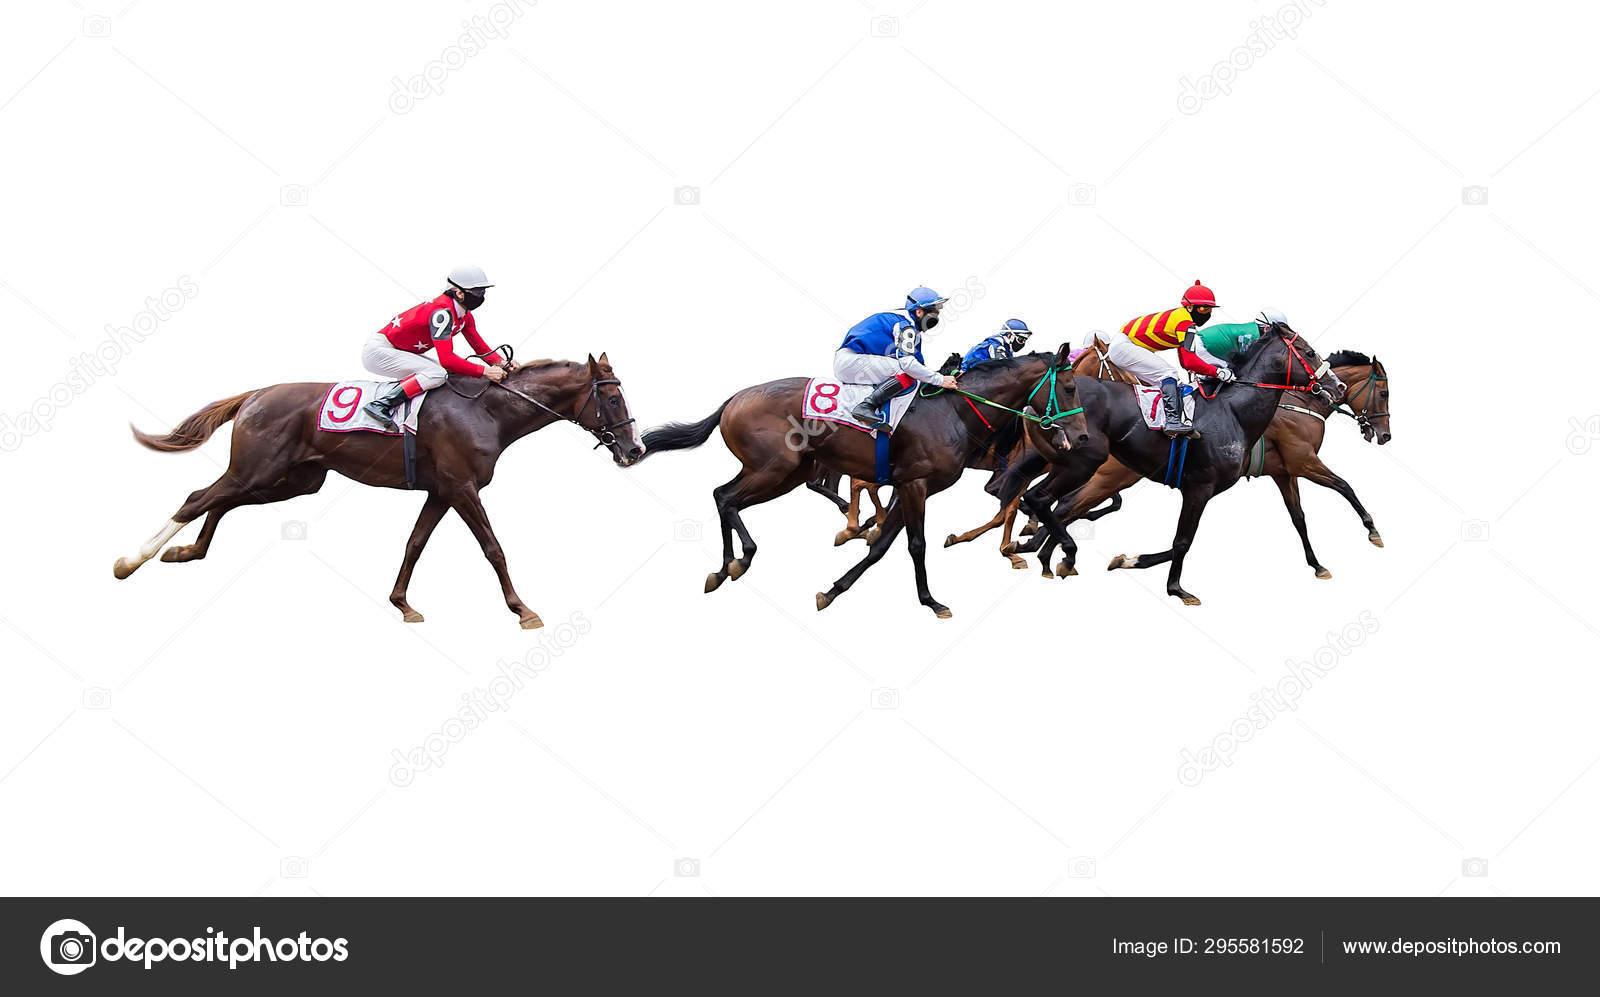 Horse Racing Jockey Isolated White Background Stock Photo C Dikkenss 295581592